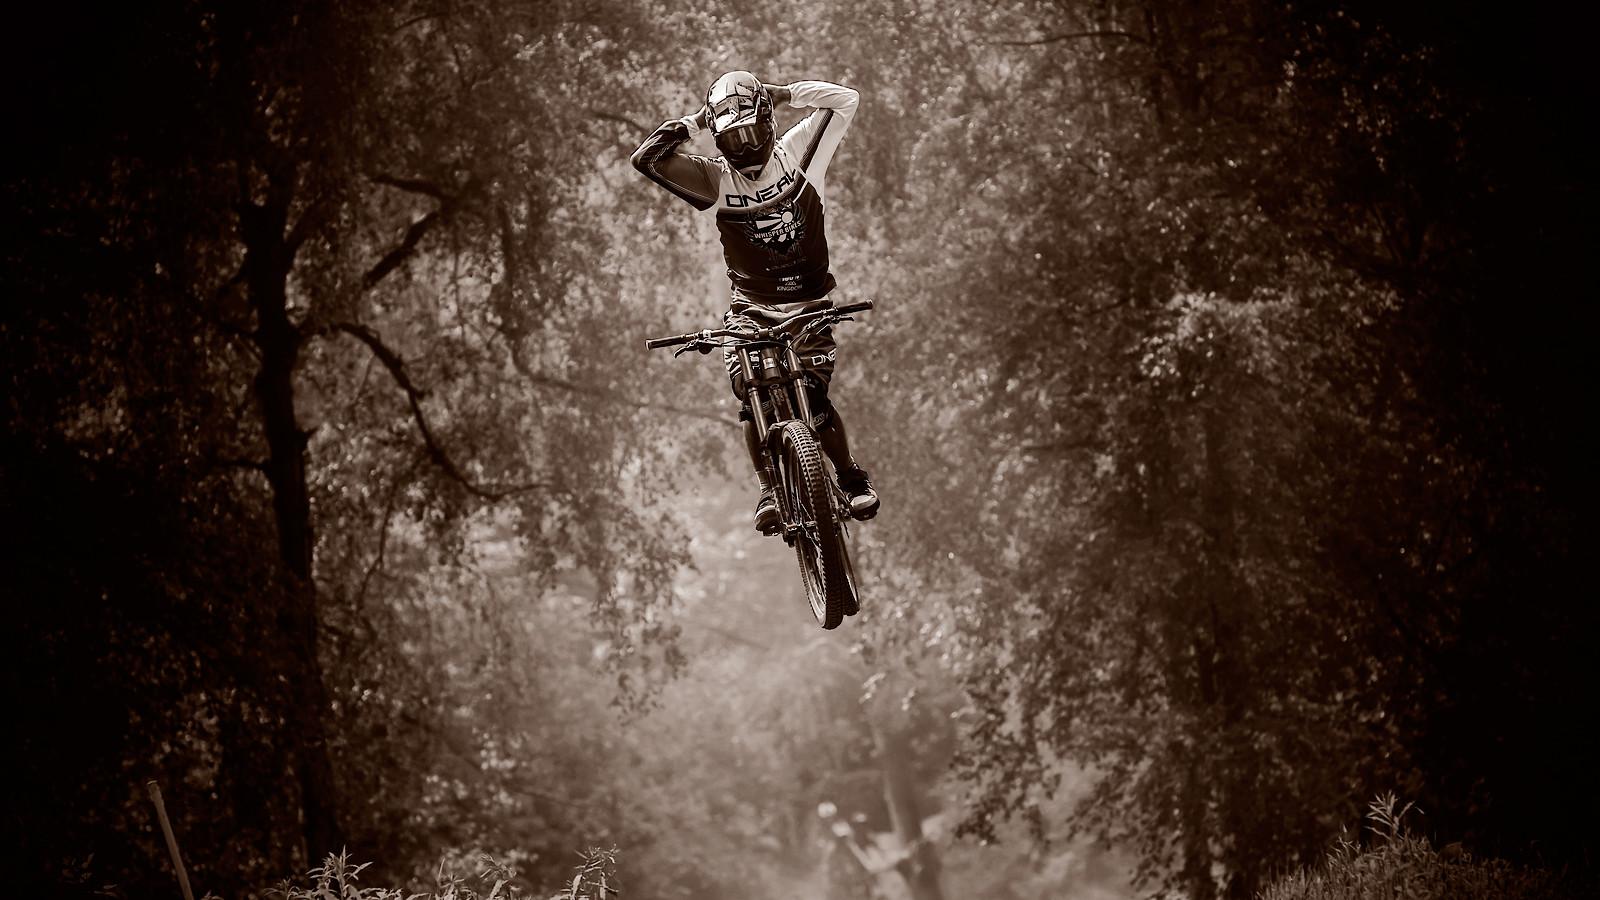 32994518980 aaa59bb08b o - phunkt.com - Mountain Biking Pictures - Vital MTB